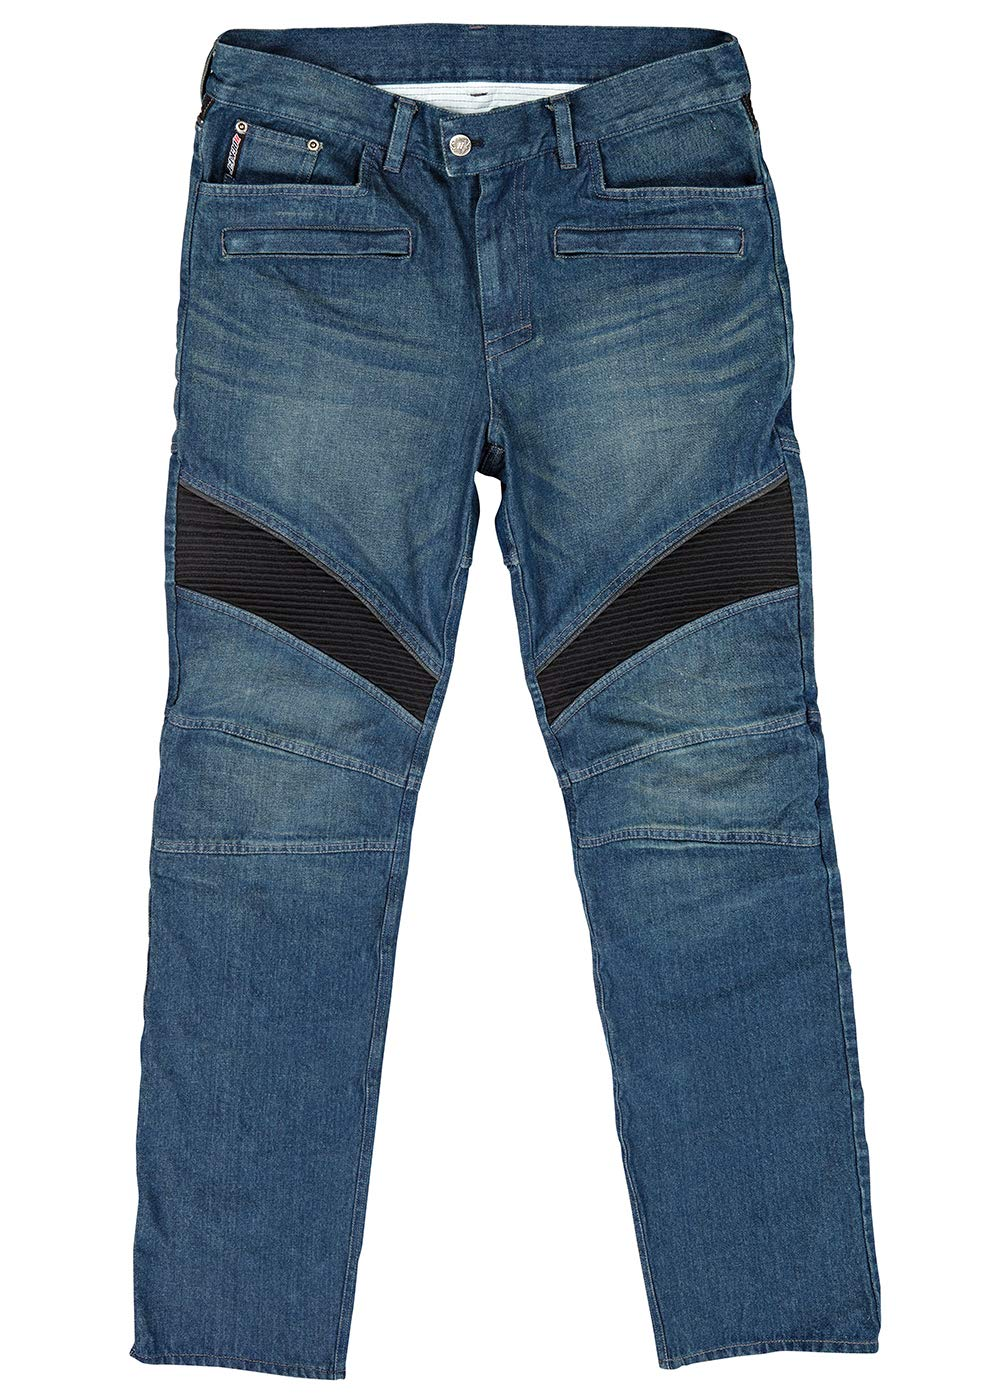 ScorpionExo Covert Jeans Mens Reinforced Motorcycle Pants Black, Size 32